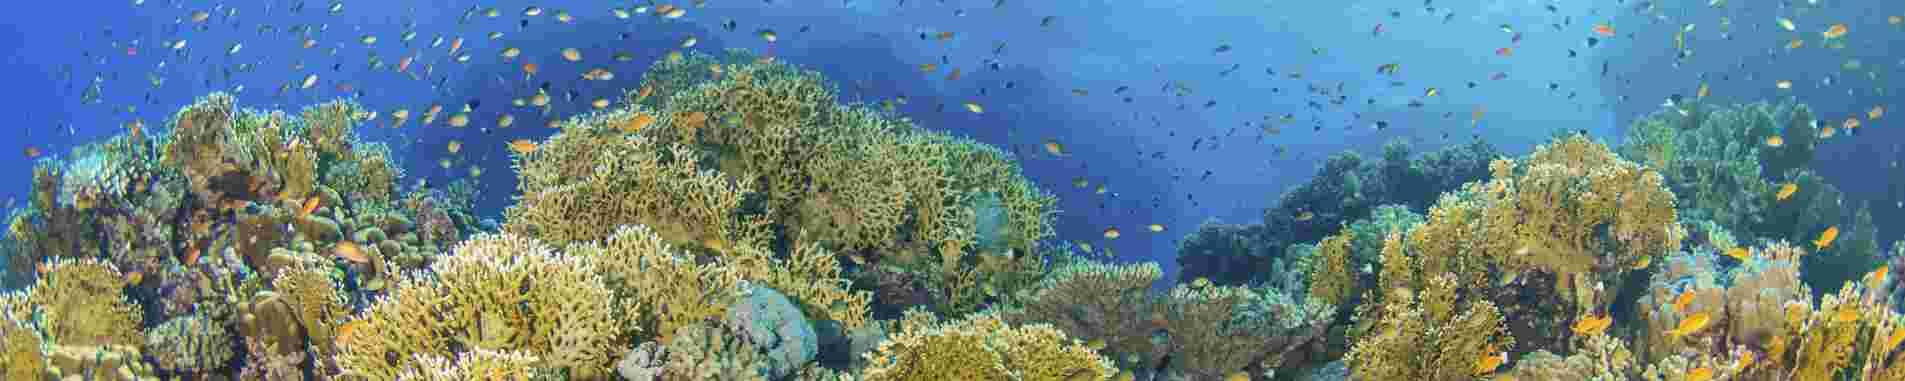 Great Barrier Reef (Northern) header image